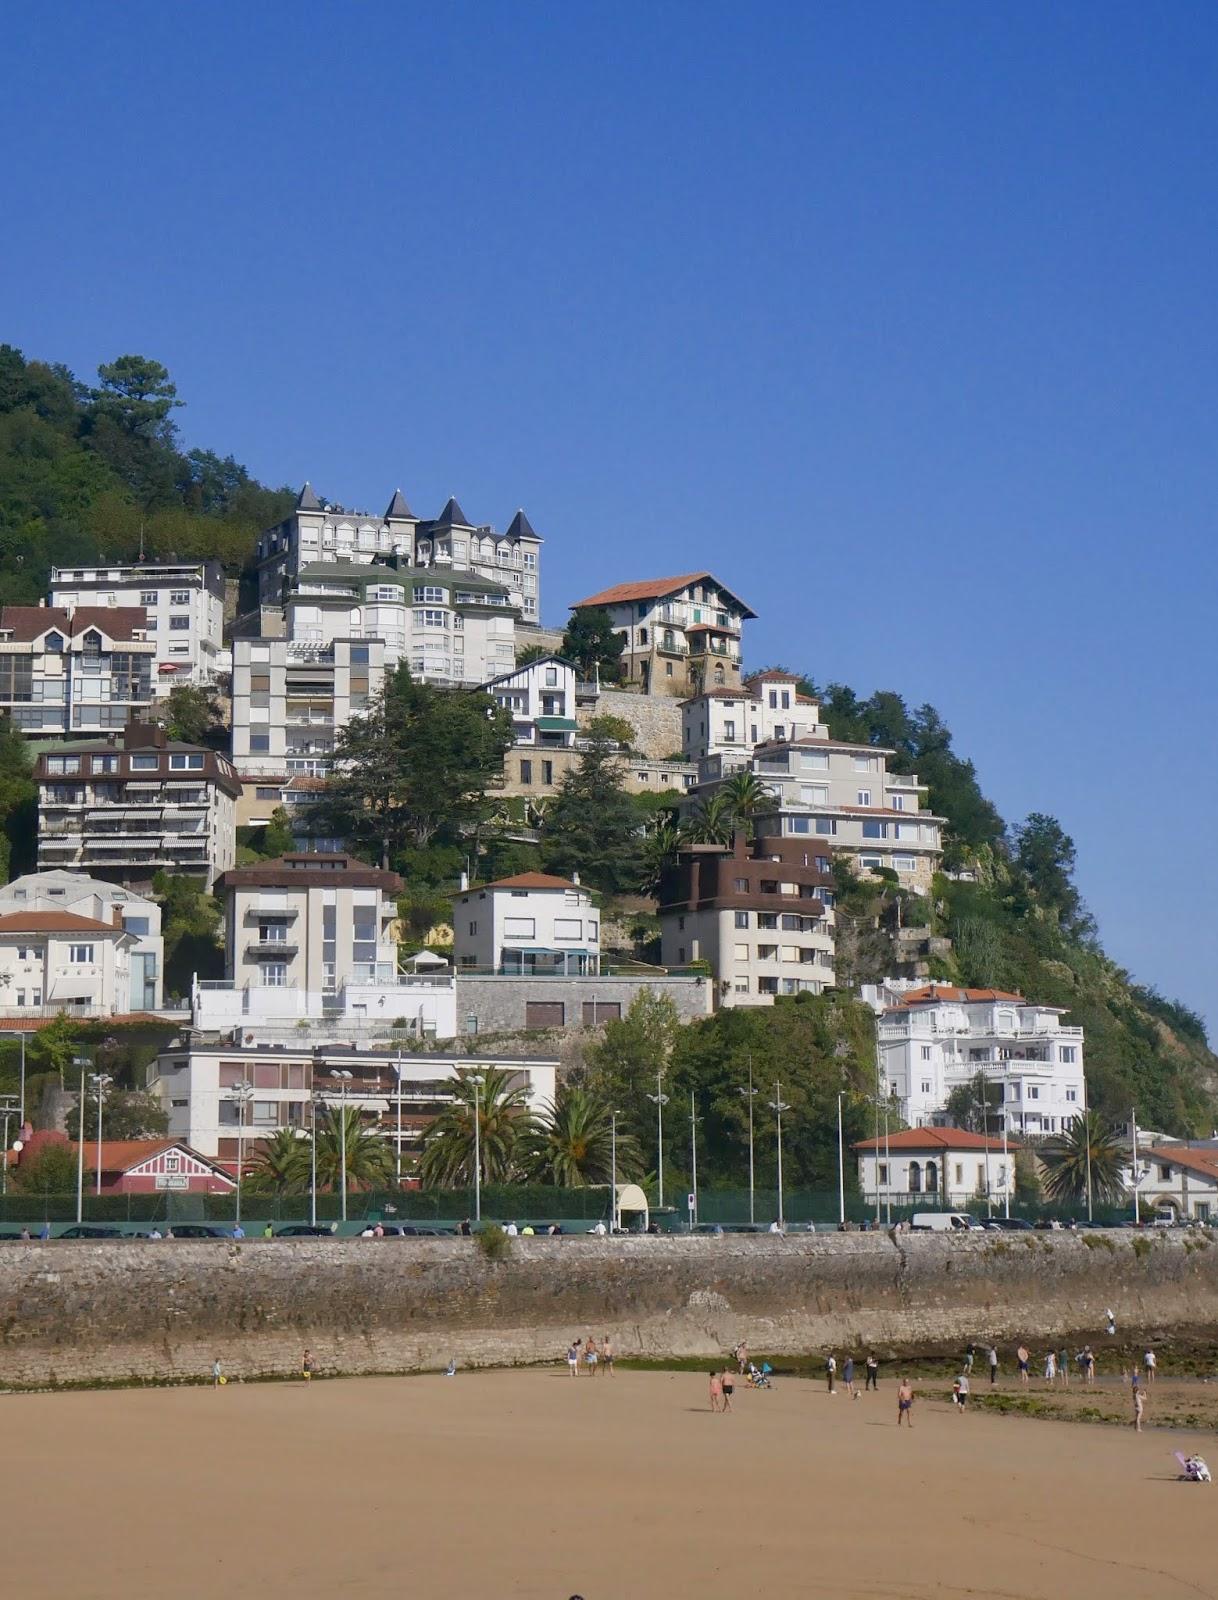 Architecture Playa de la Concha San Sebastian Pays Basque Espagne